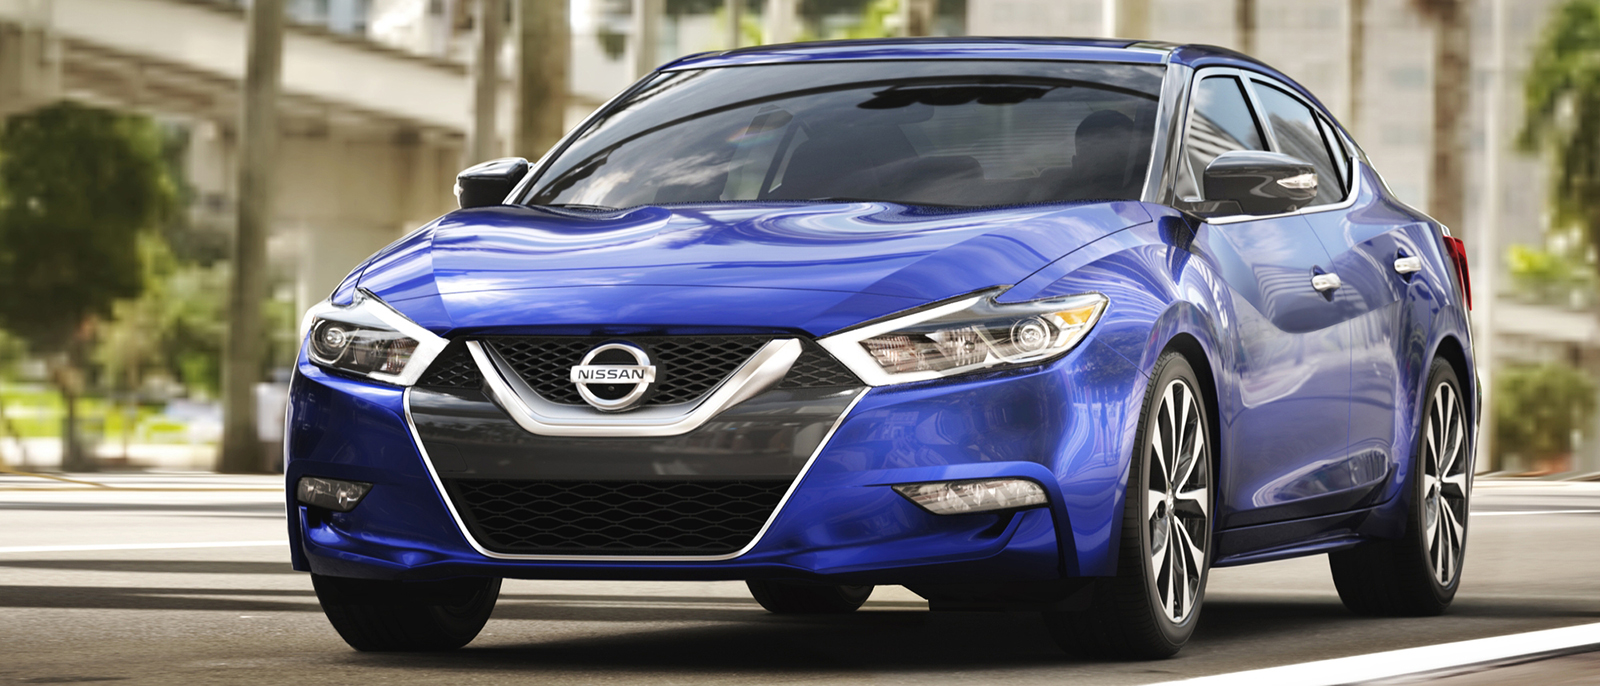 2017 Nissan Maxima blue